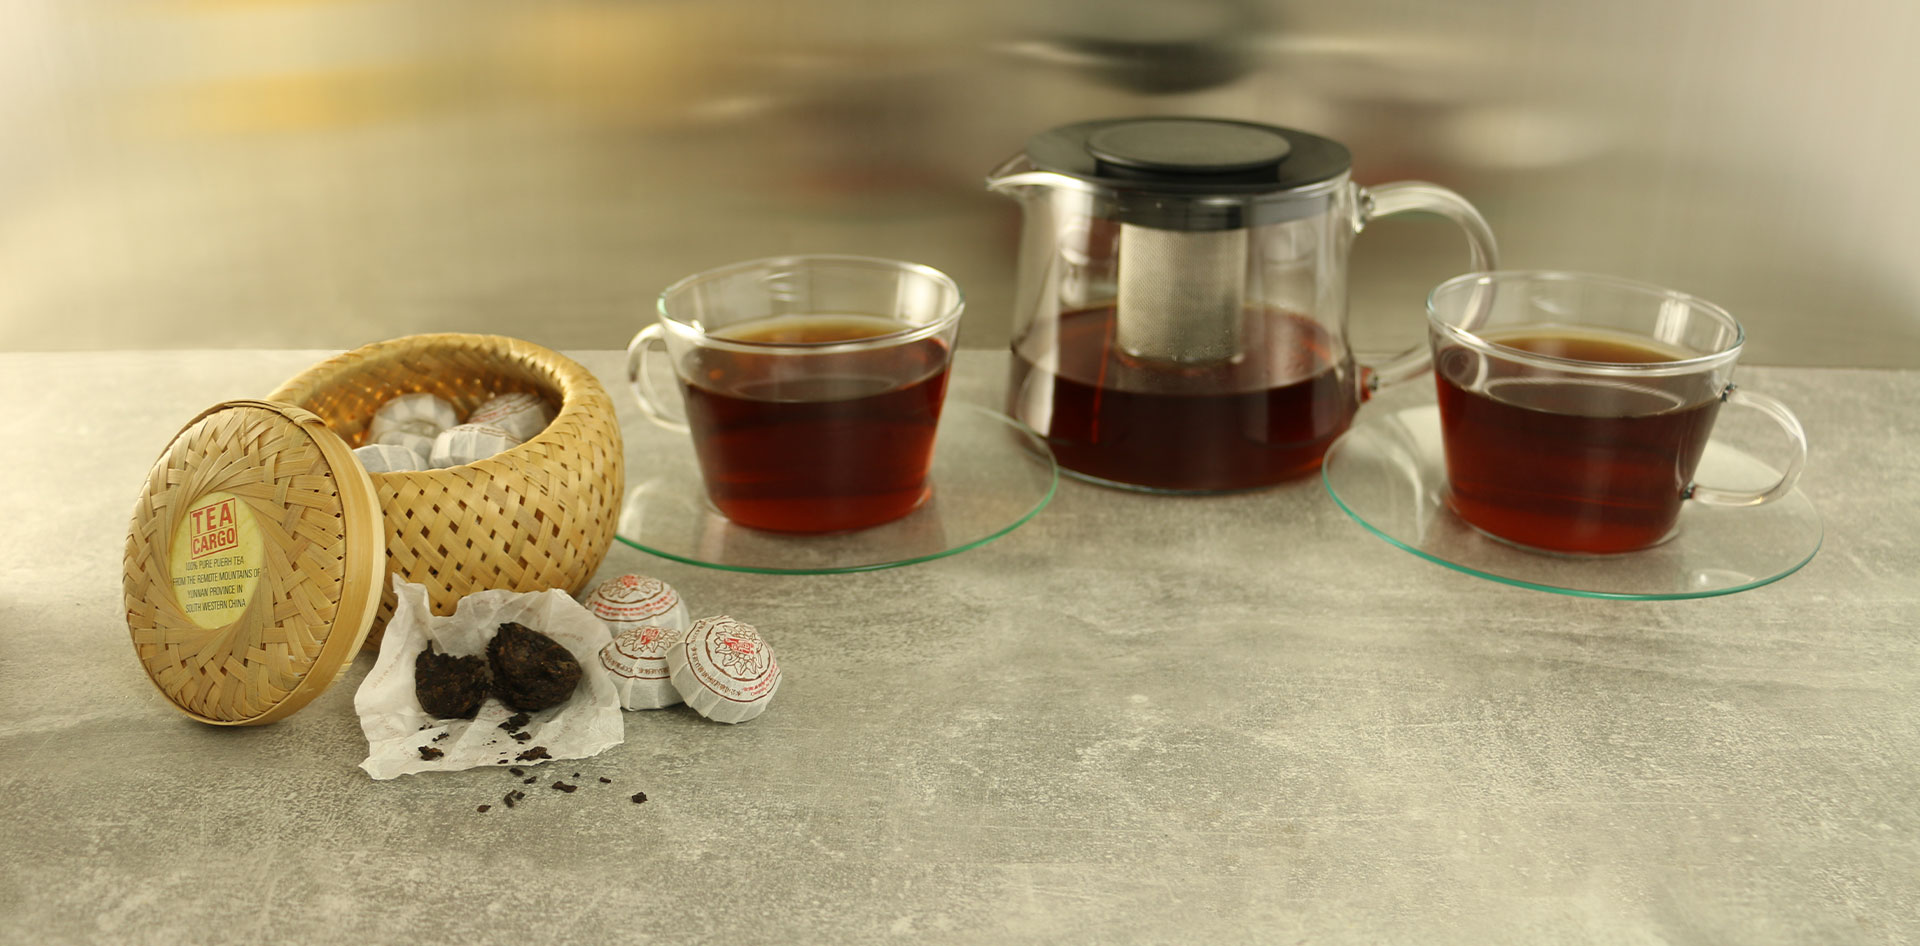 Puerh Tea Cakes